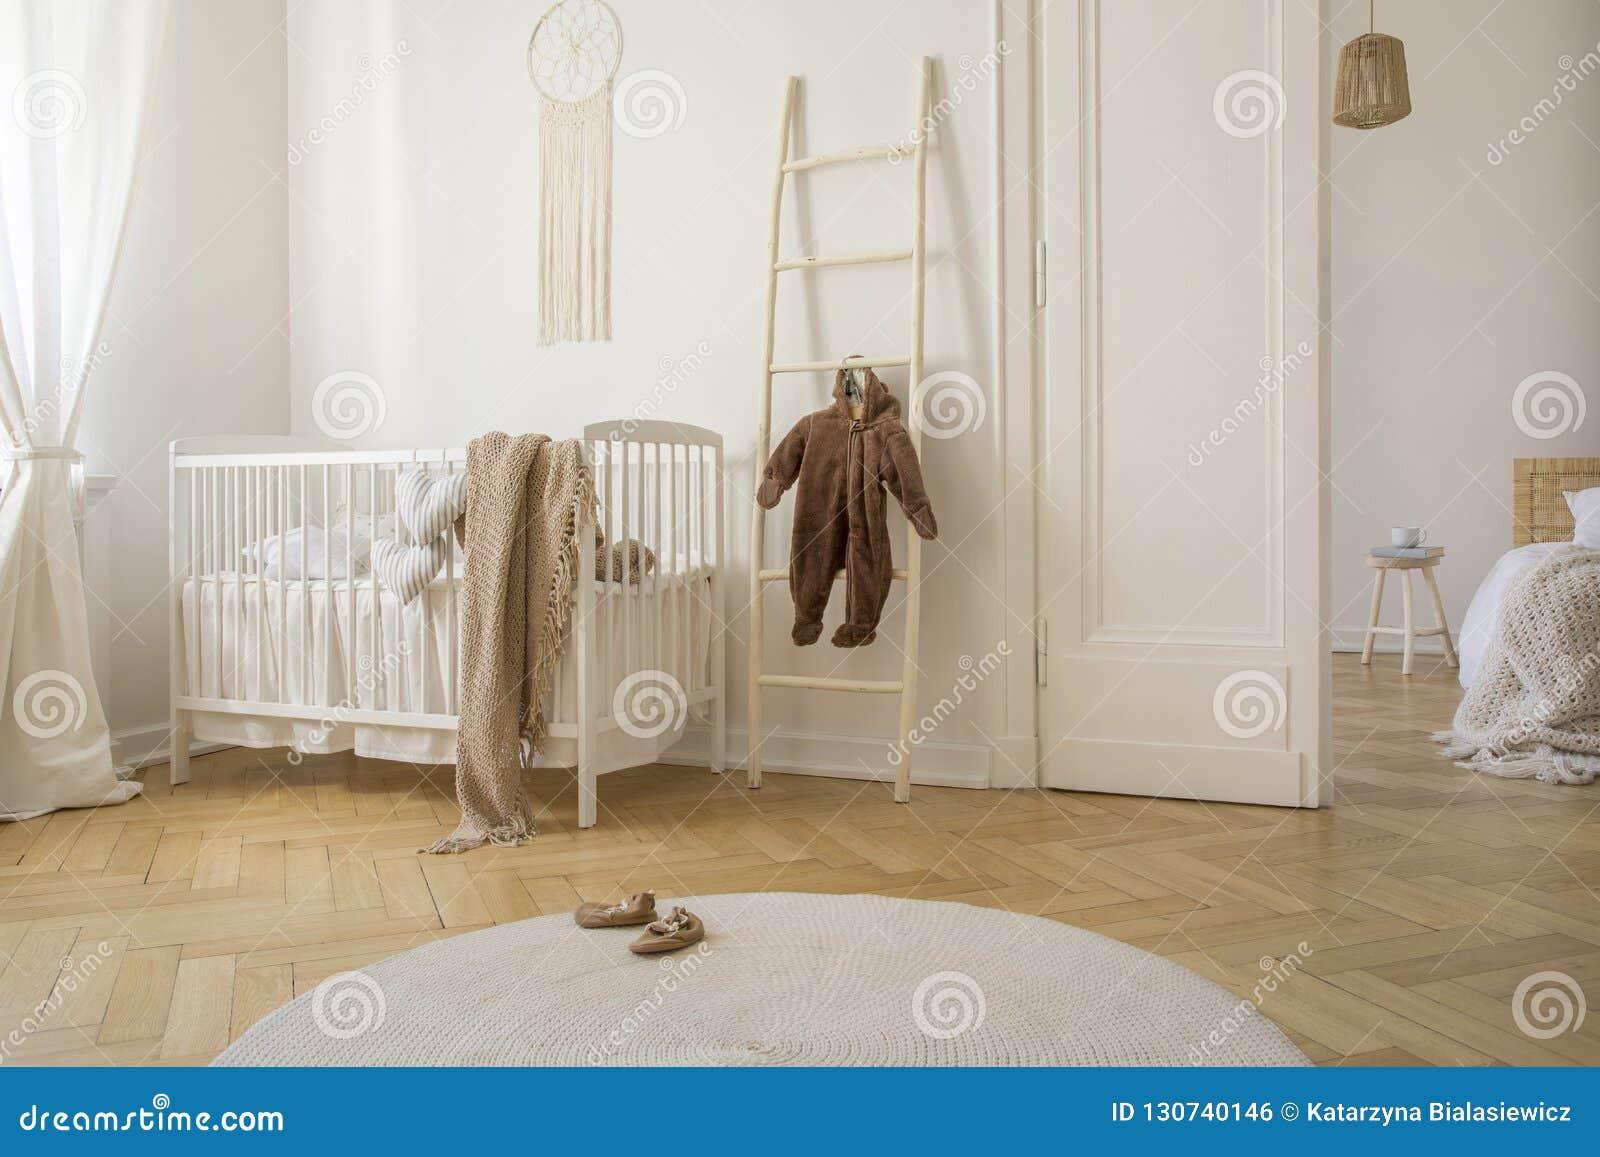 White carpet on the wooden floor of scandinavian nursery, real photo